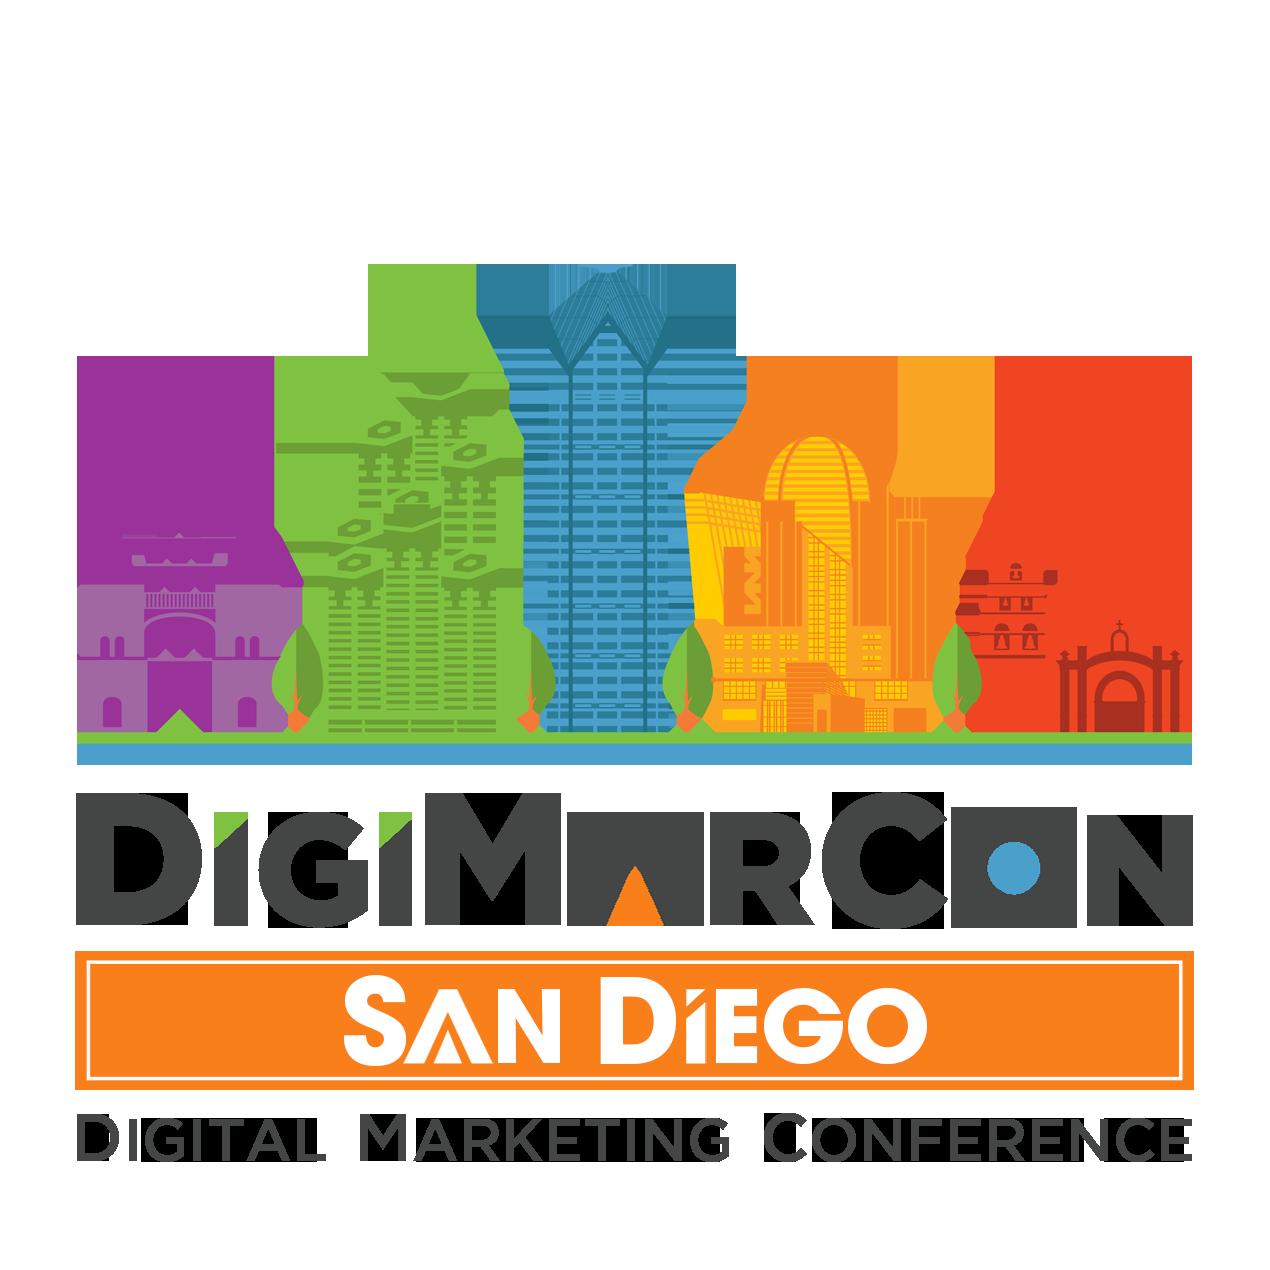 DigiMarCon California, DigiMarCon California